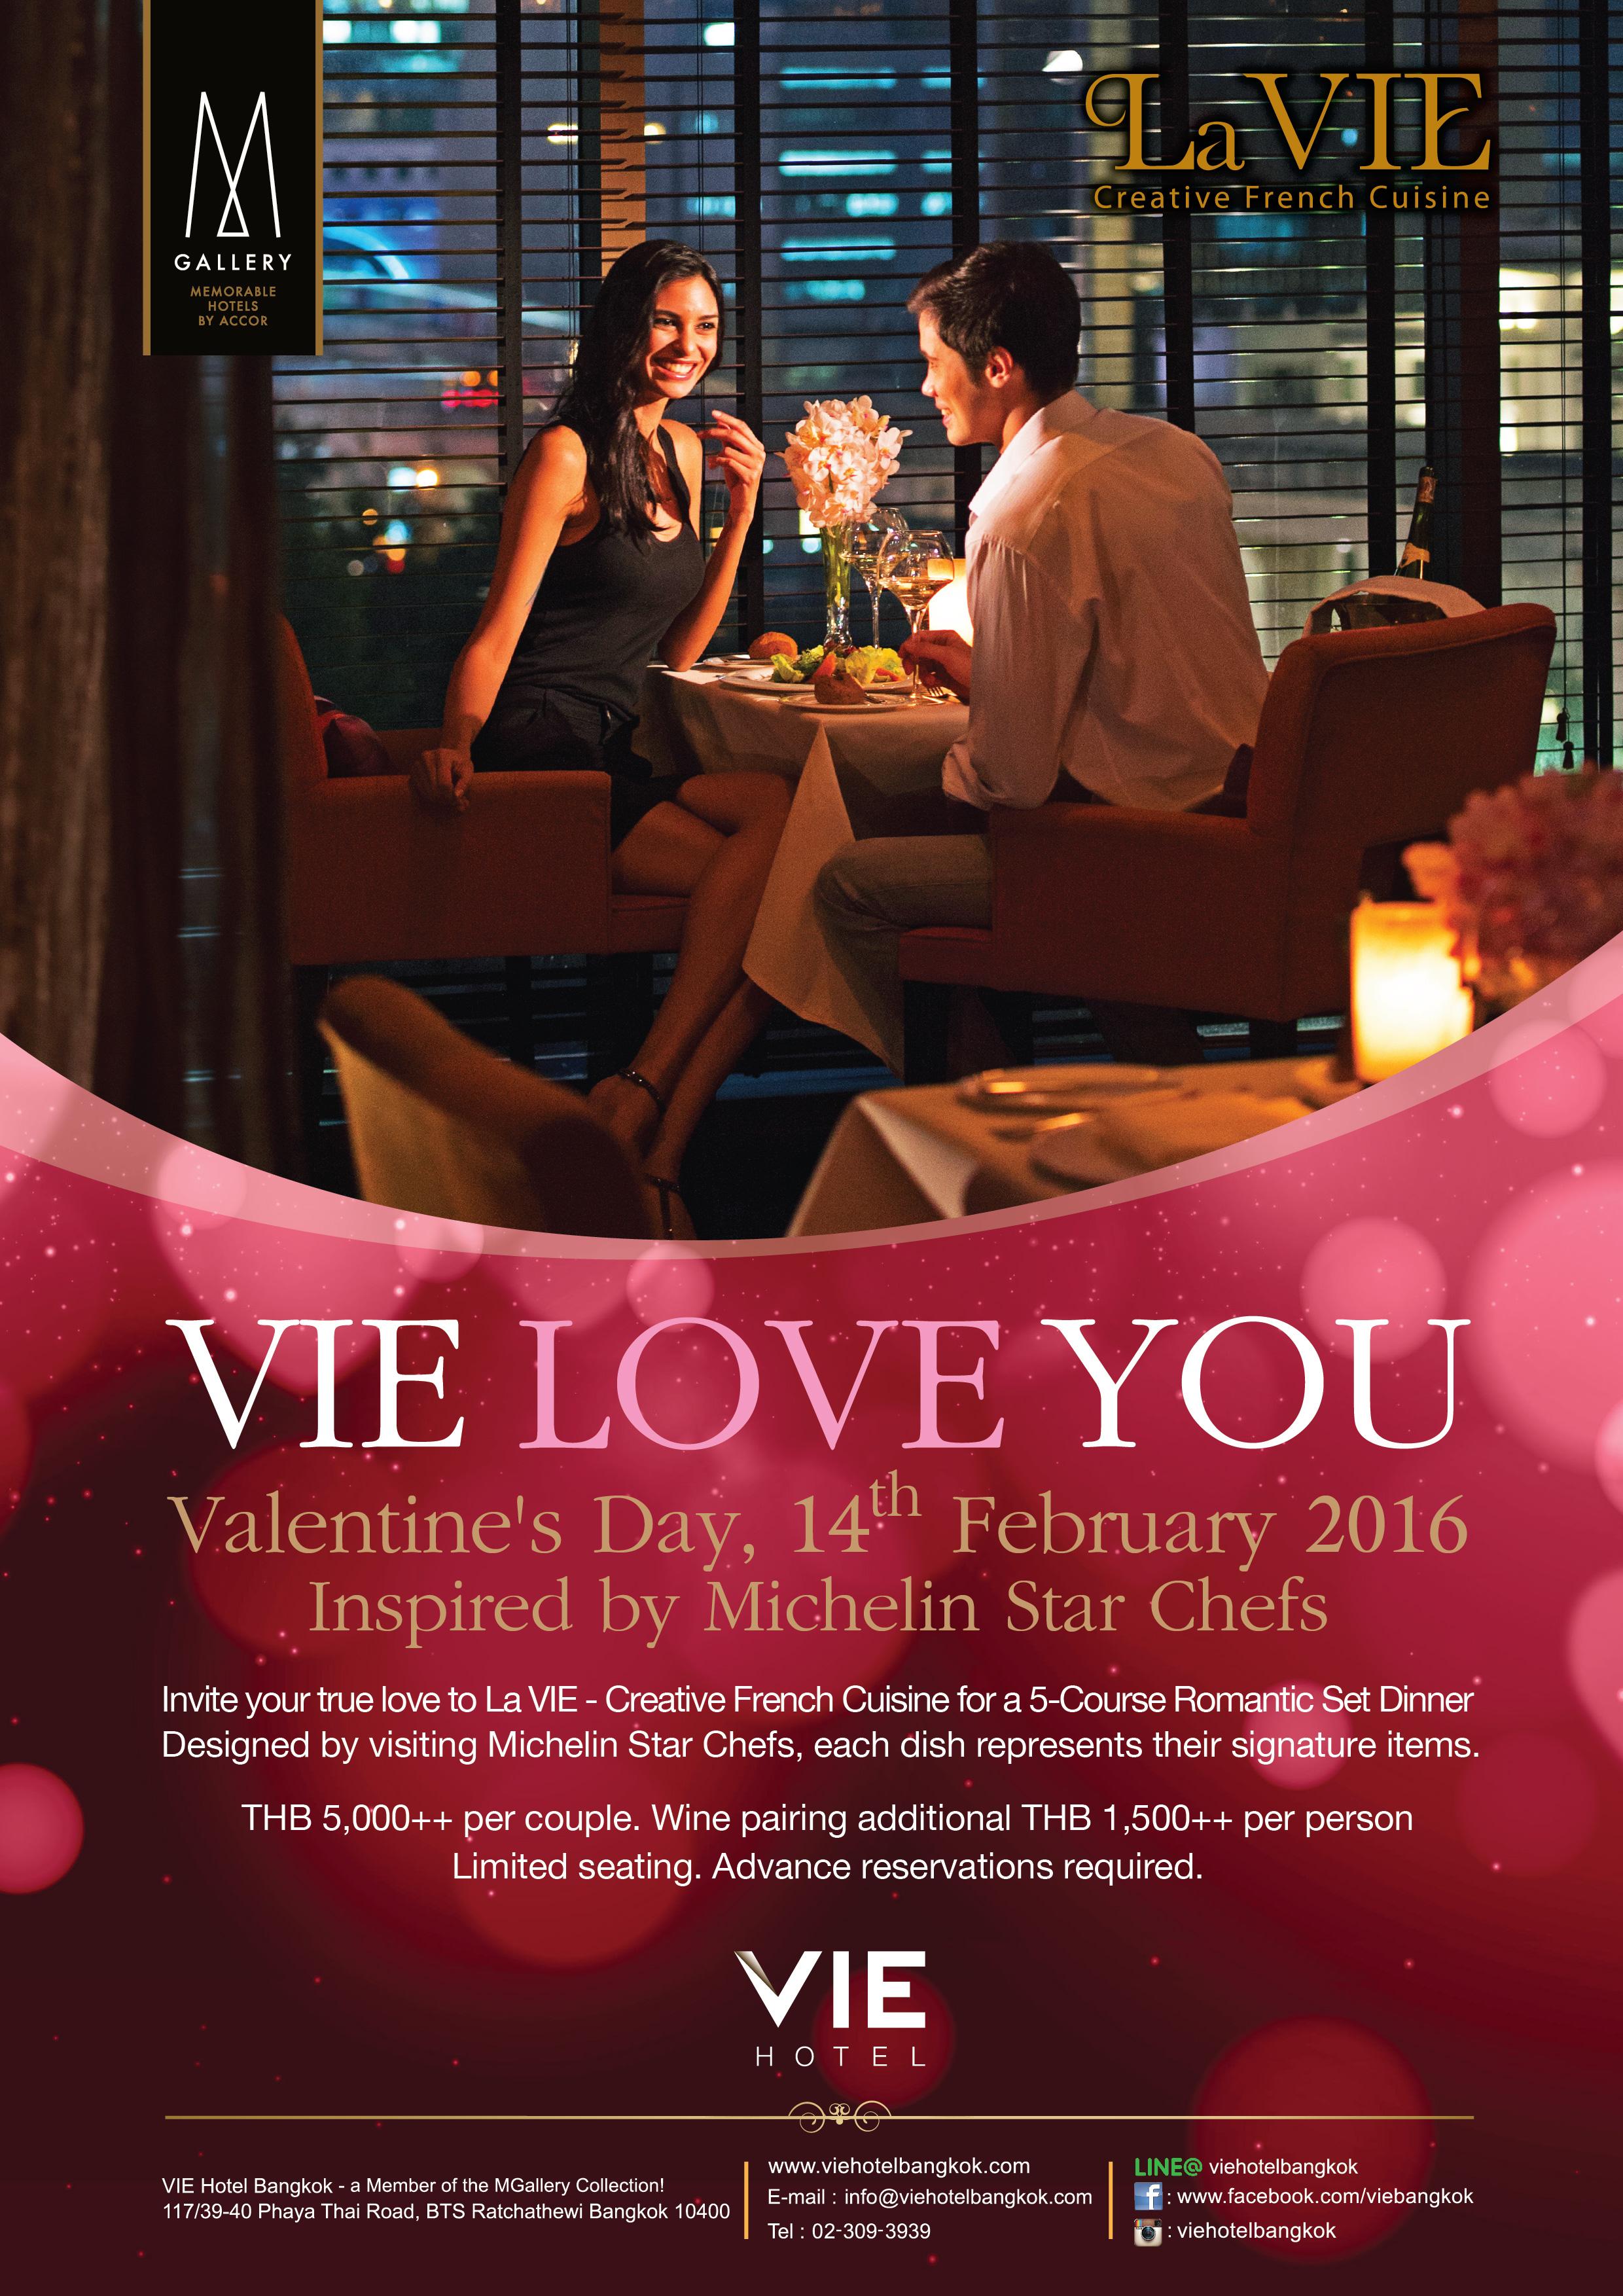 VIE LOVE YOU - Valentine's Set Dinner inspired by Michelin Star Chef